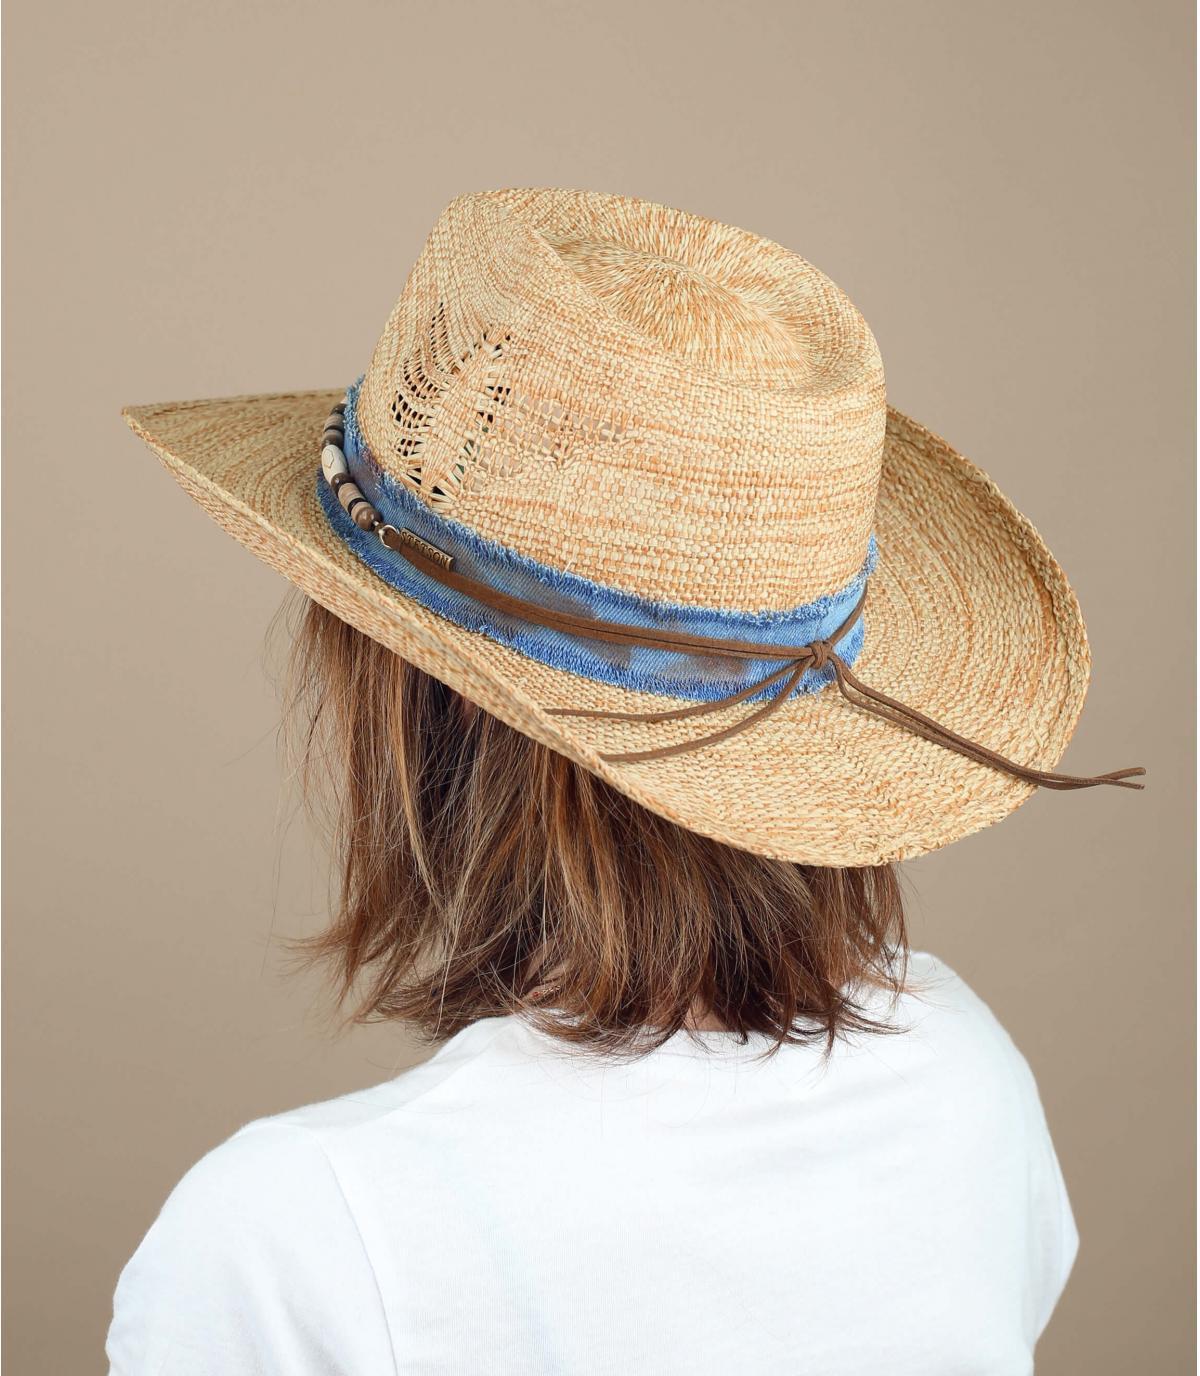 Cowboy hat beads